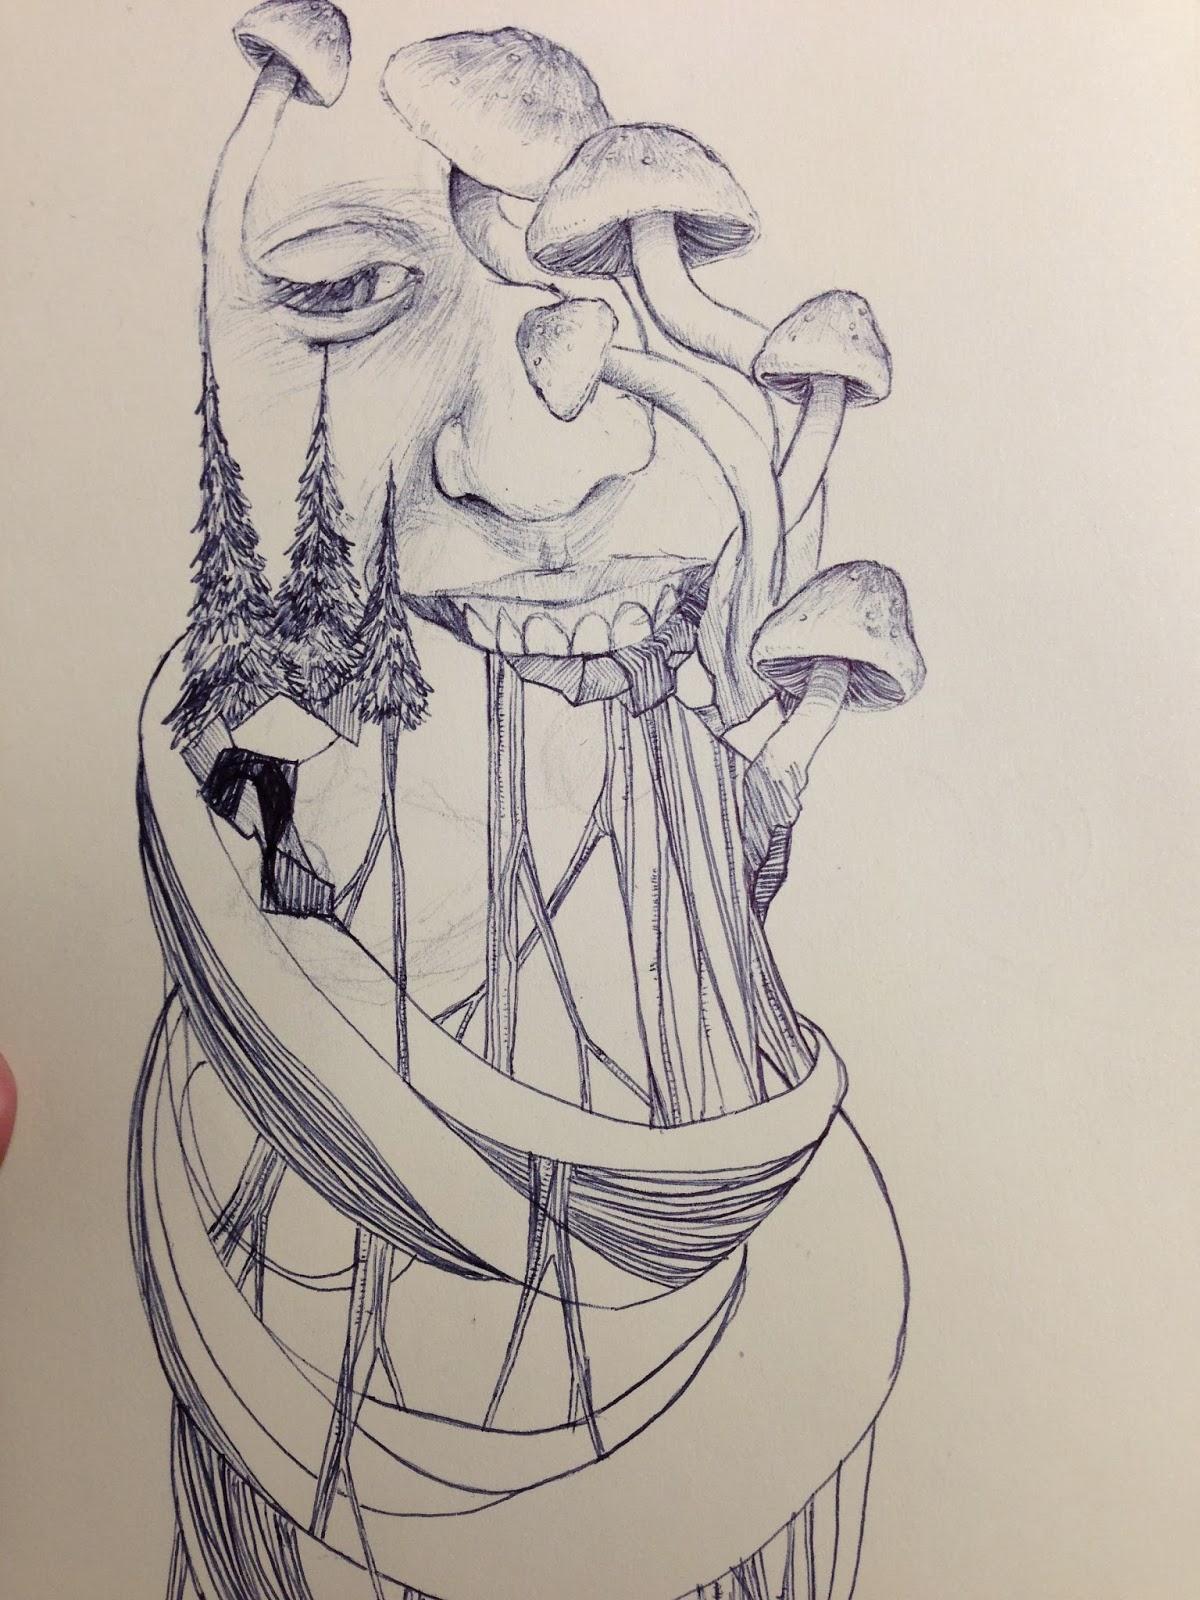 The arts of jared alvarado november 2013 for Modern drawing styles